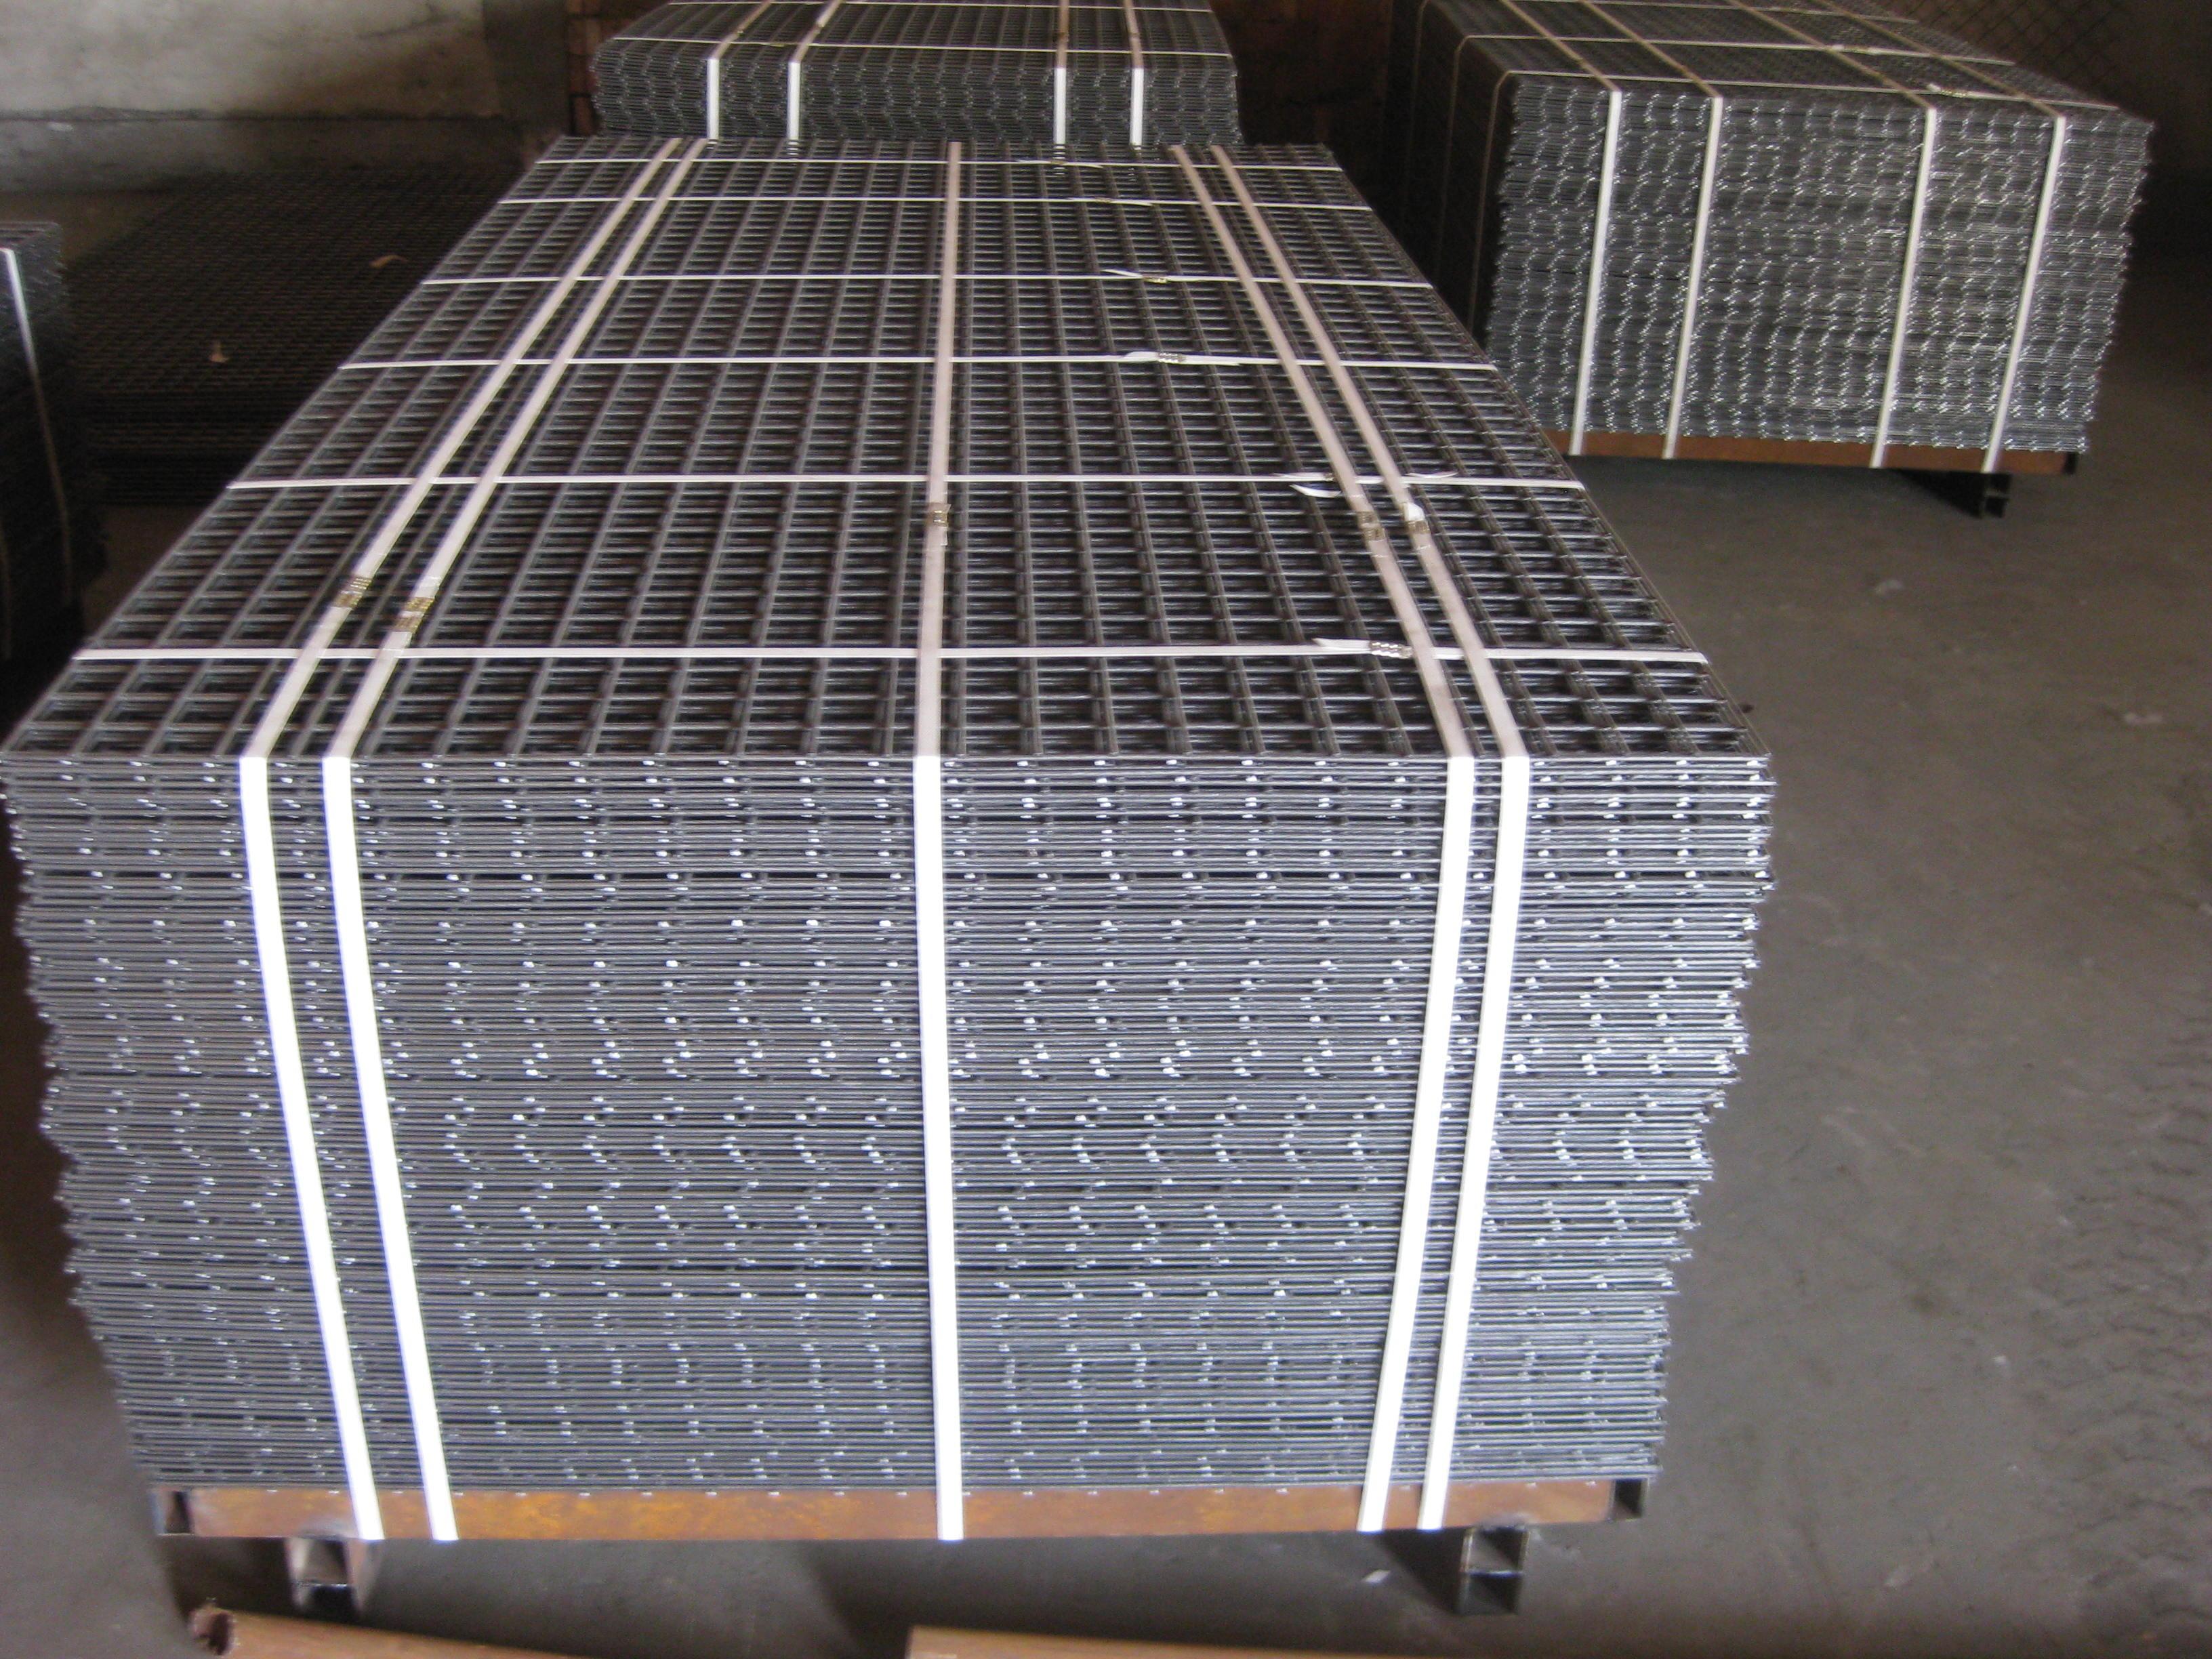 Welded Wire Mesh : Welded wire mesh sheet panel